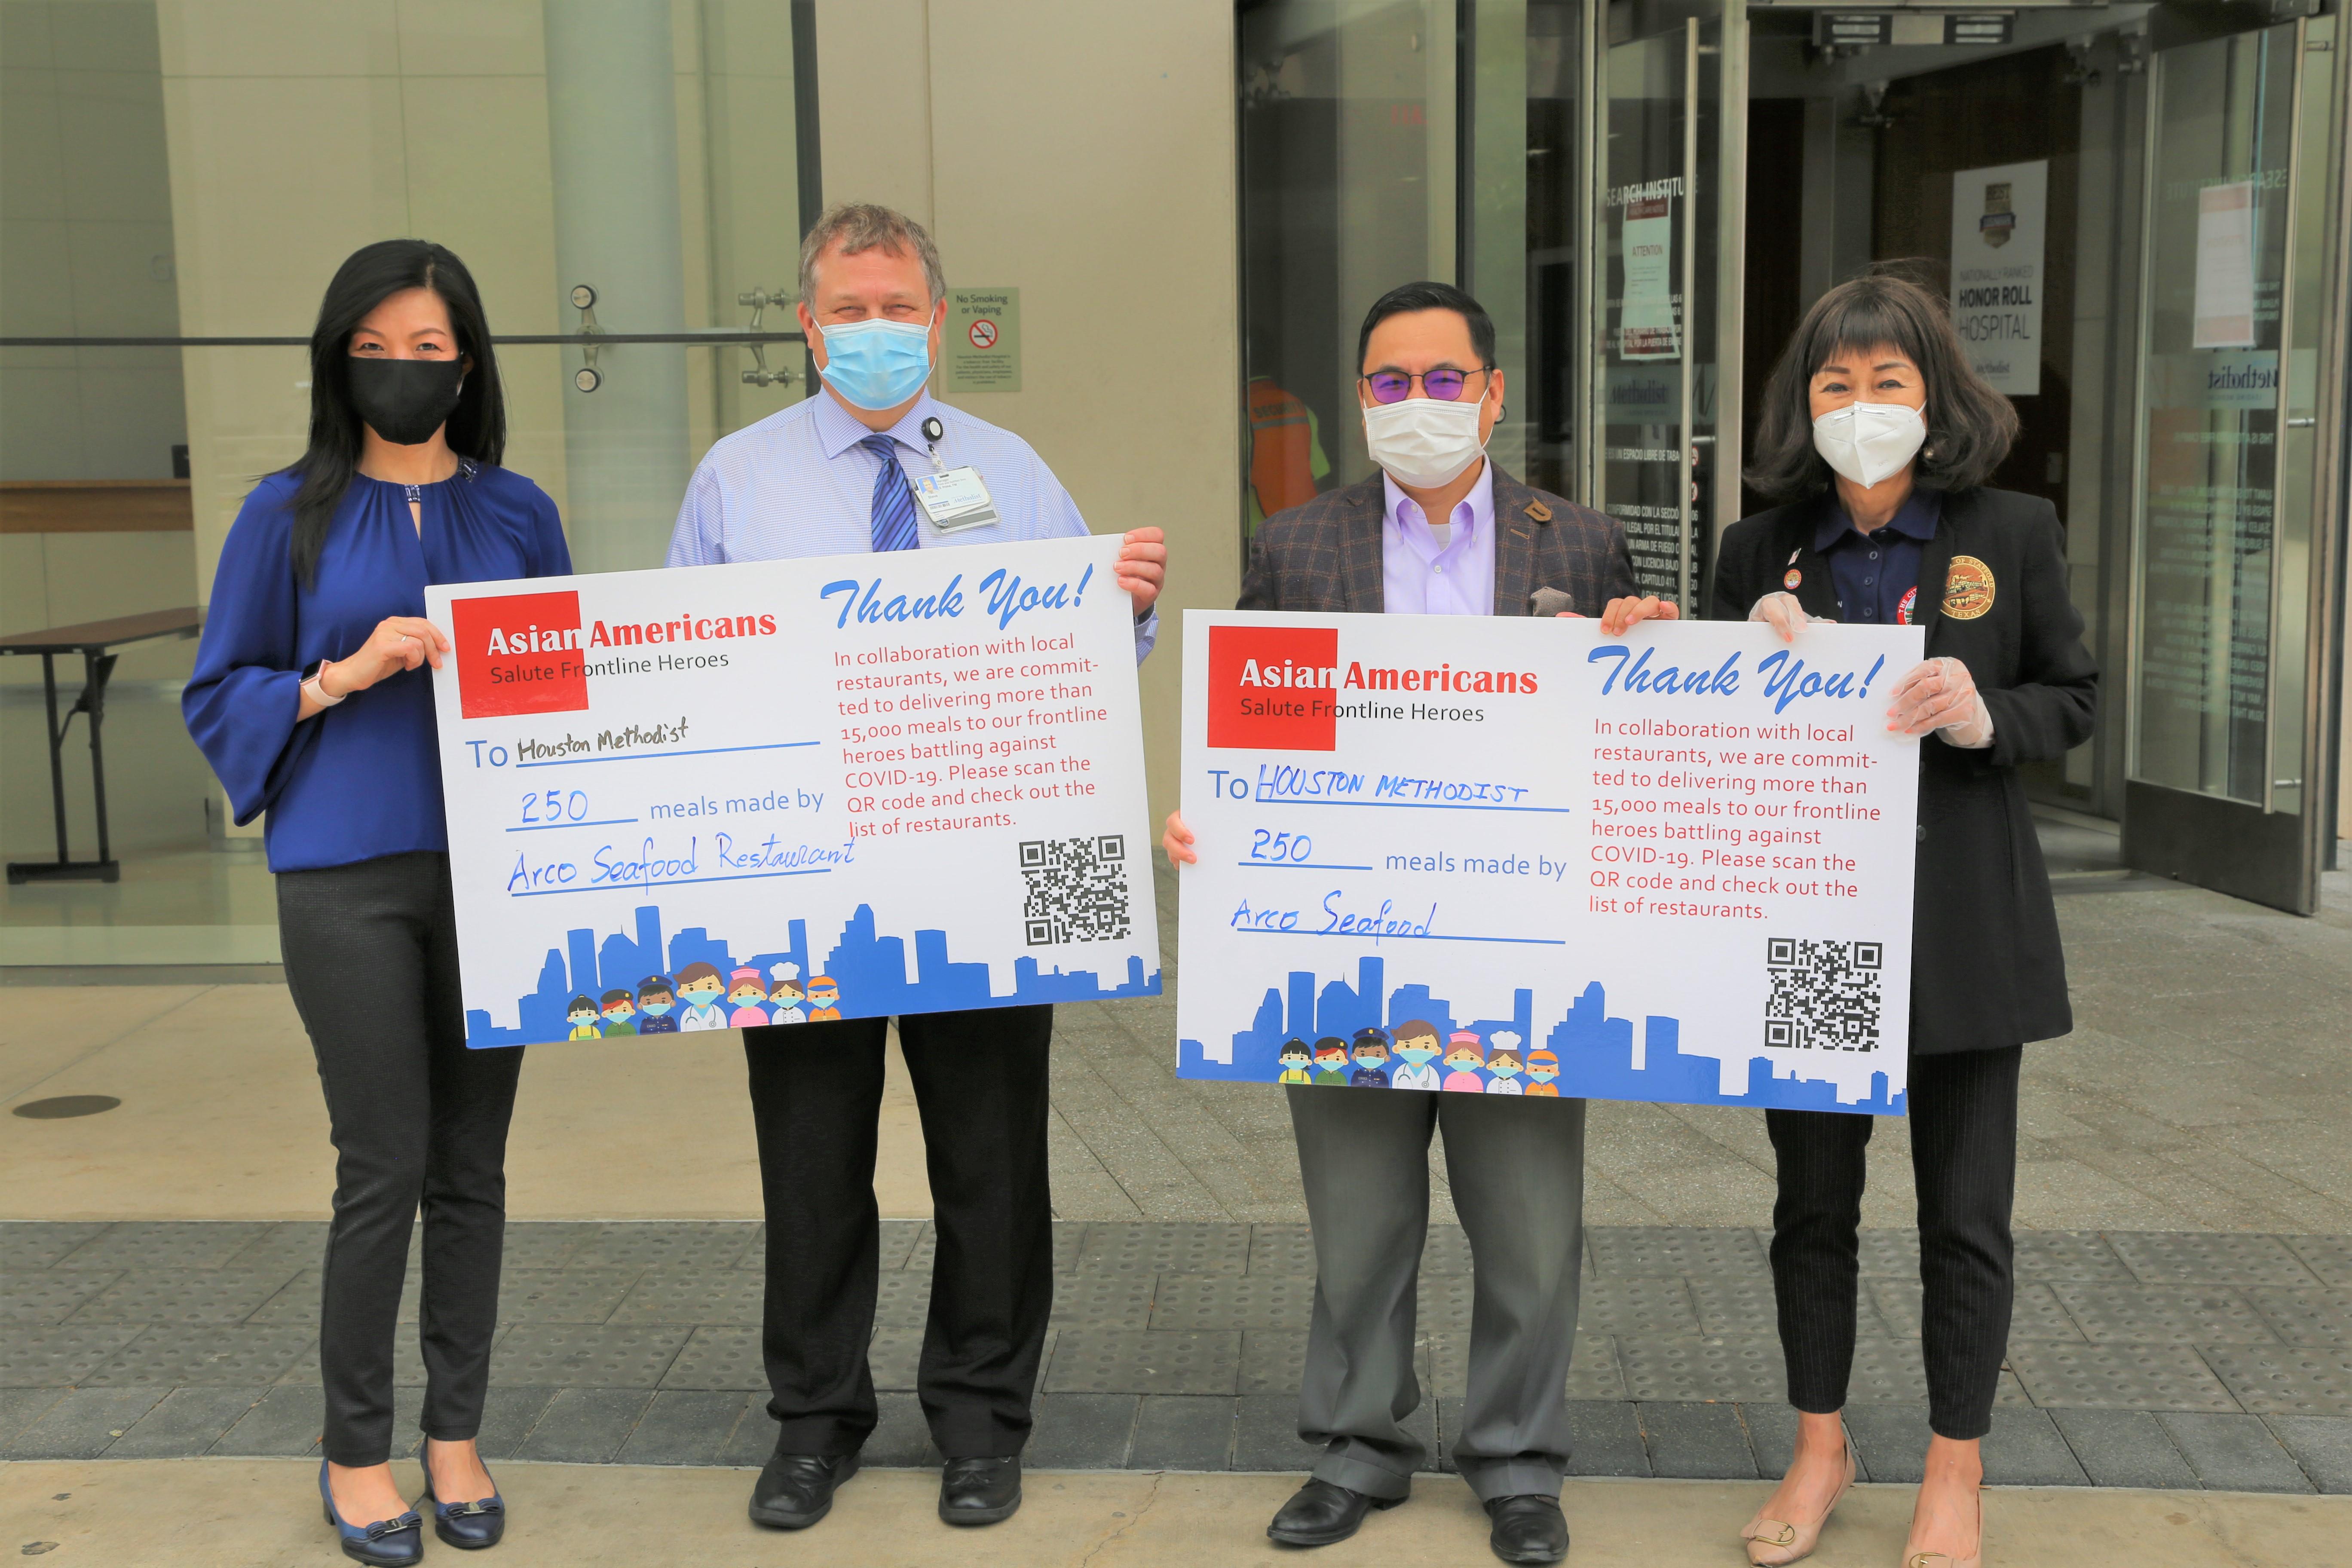 Methodist醫院經理Steve(左二)代表醫院感謝喻斌及譚秋晴等人的贊助。